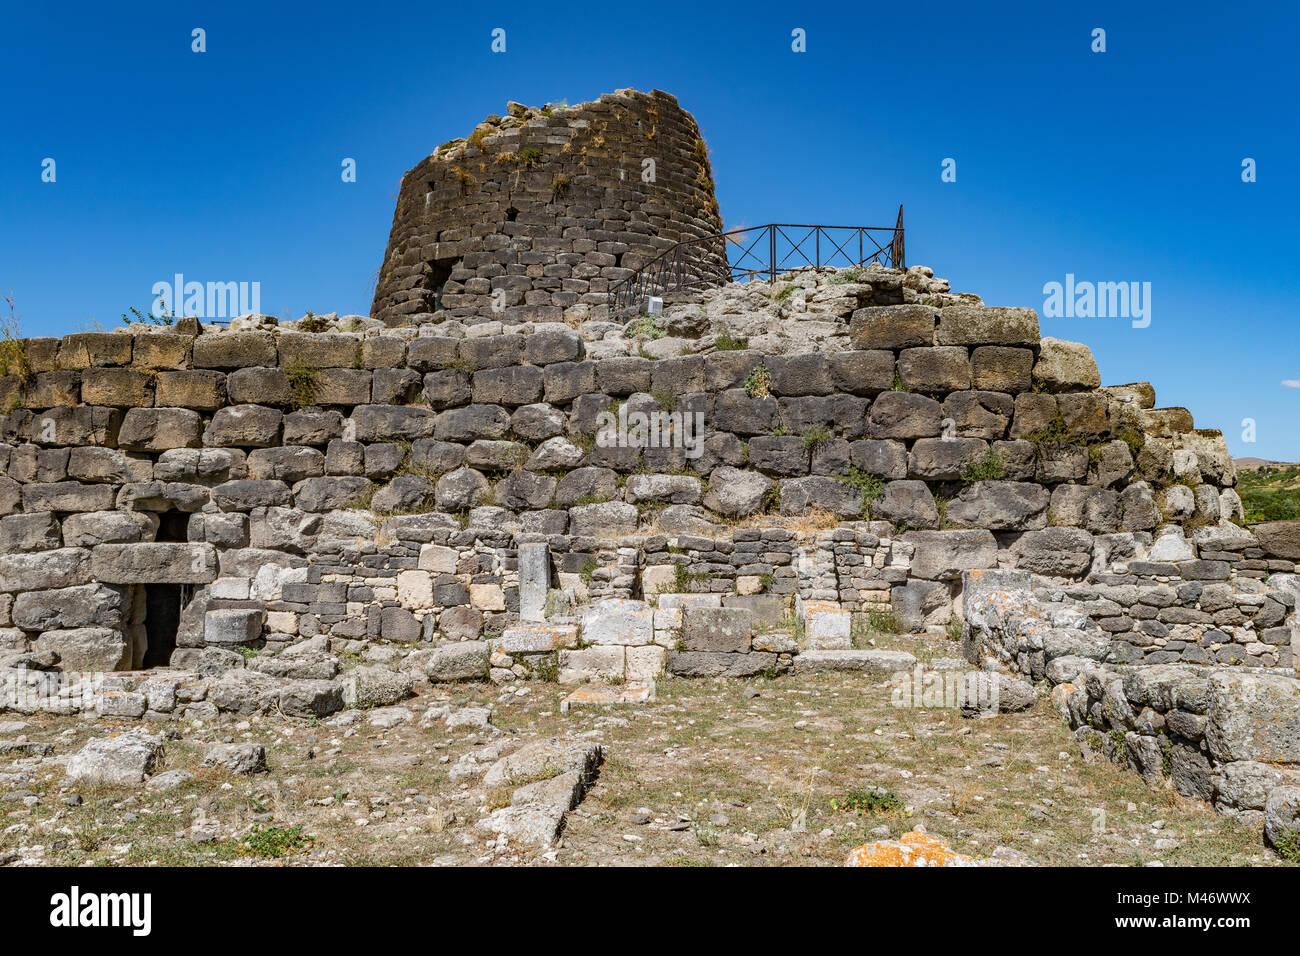 Nuraghe di Santu Antine, Sassari, Torralba, Sardinia, Italy - Stock Image